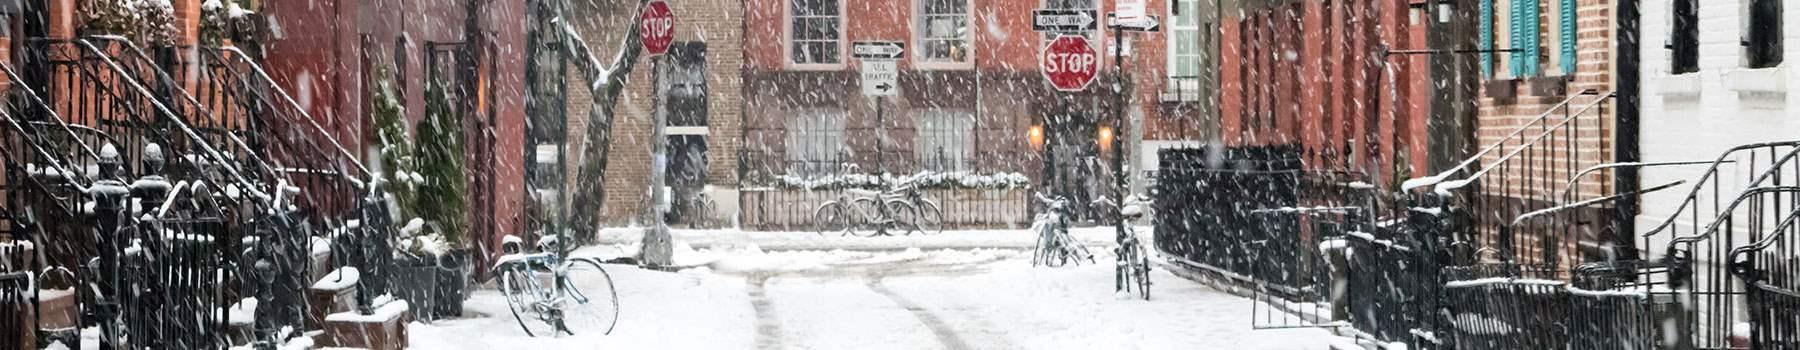 Winter in New York City